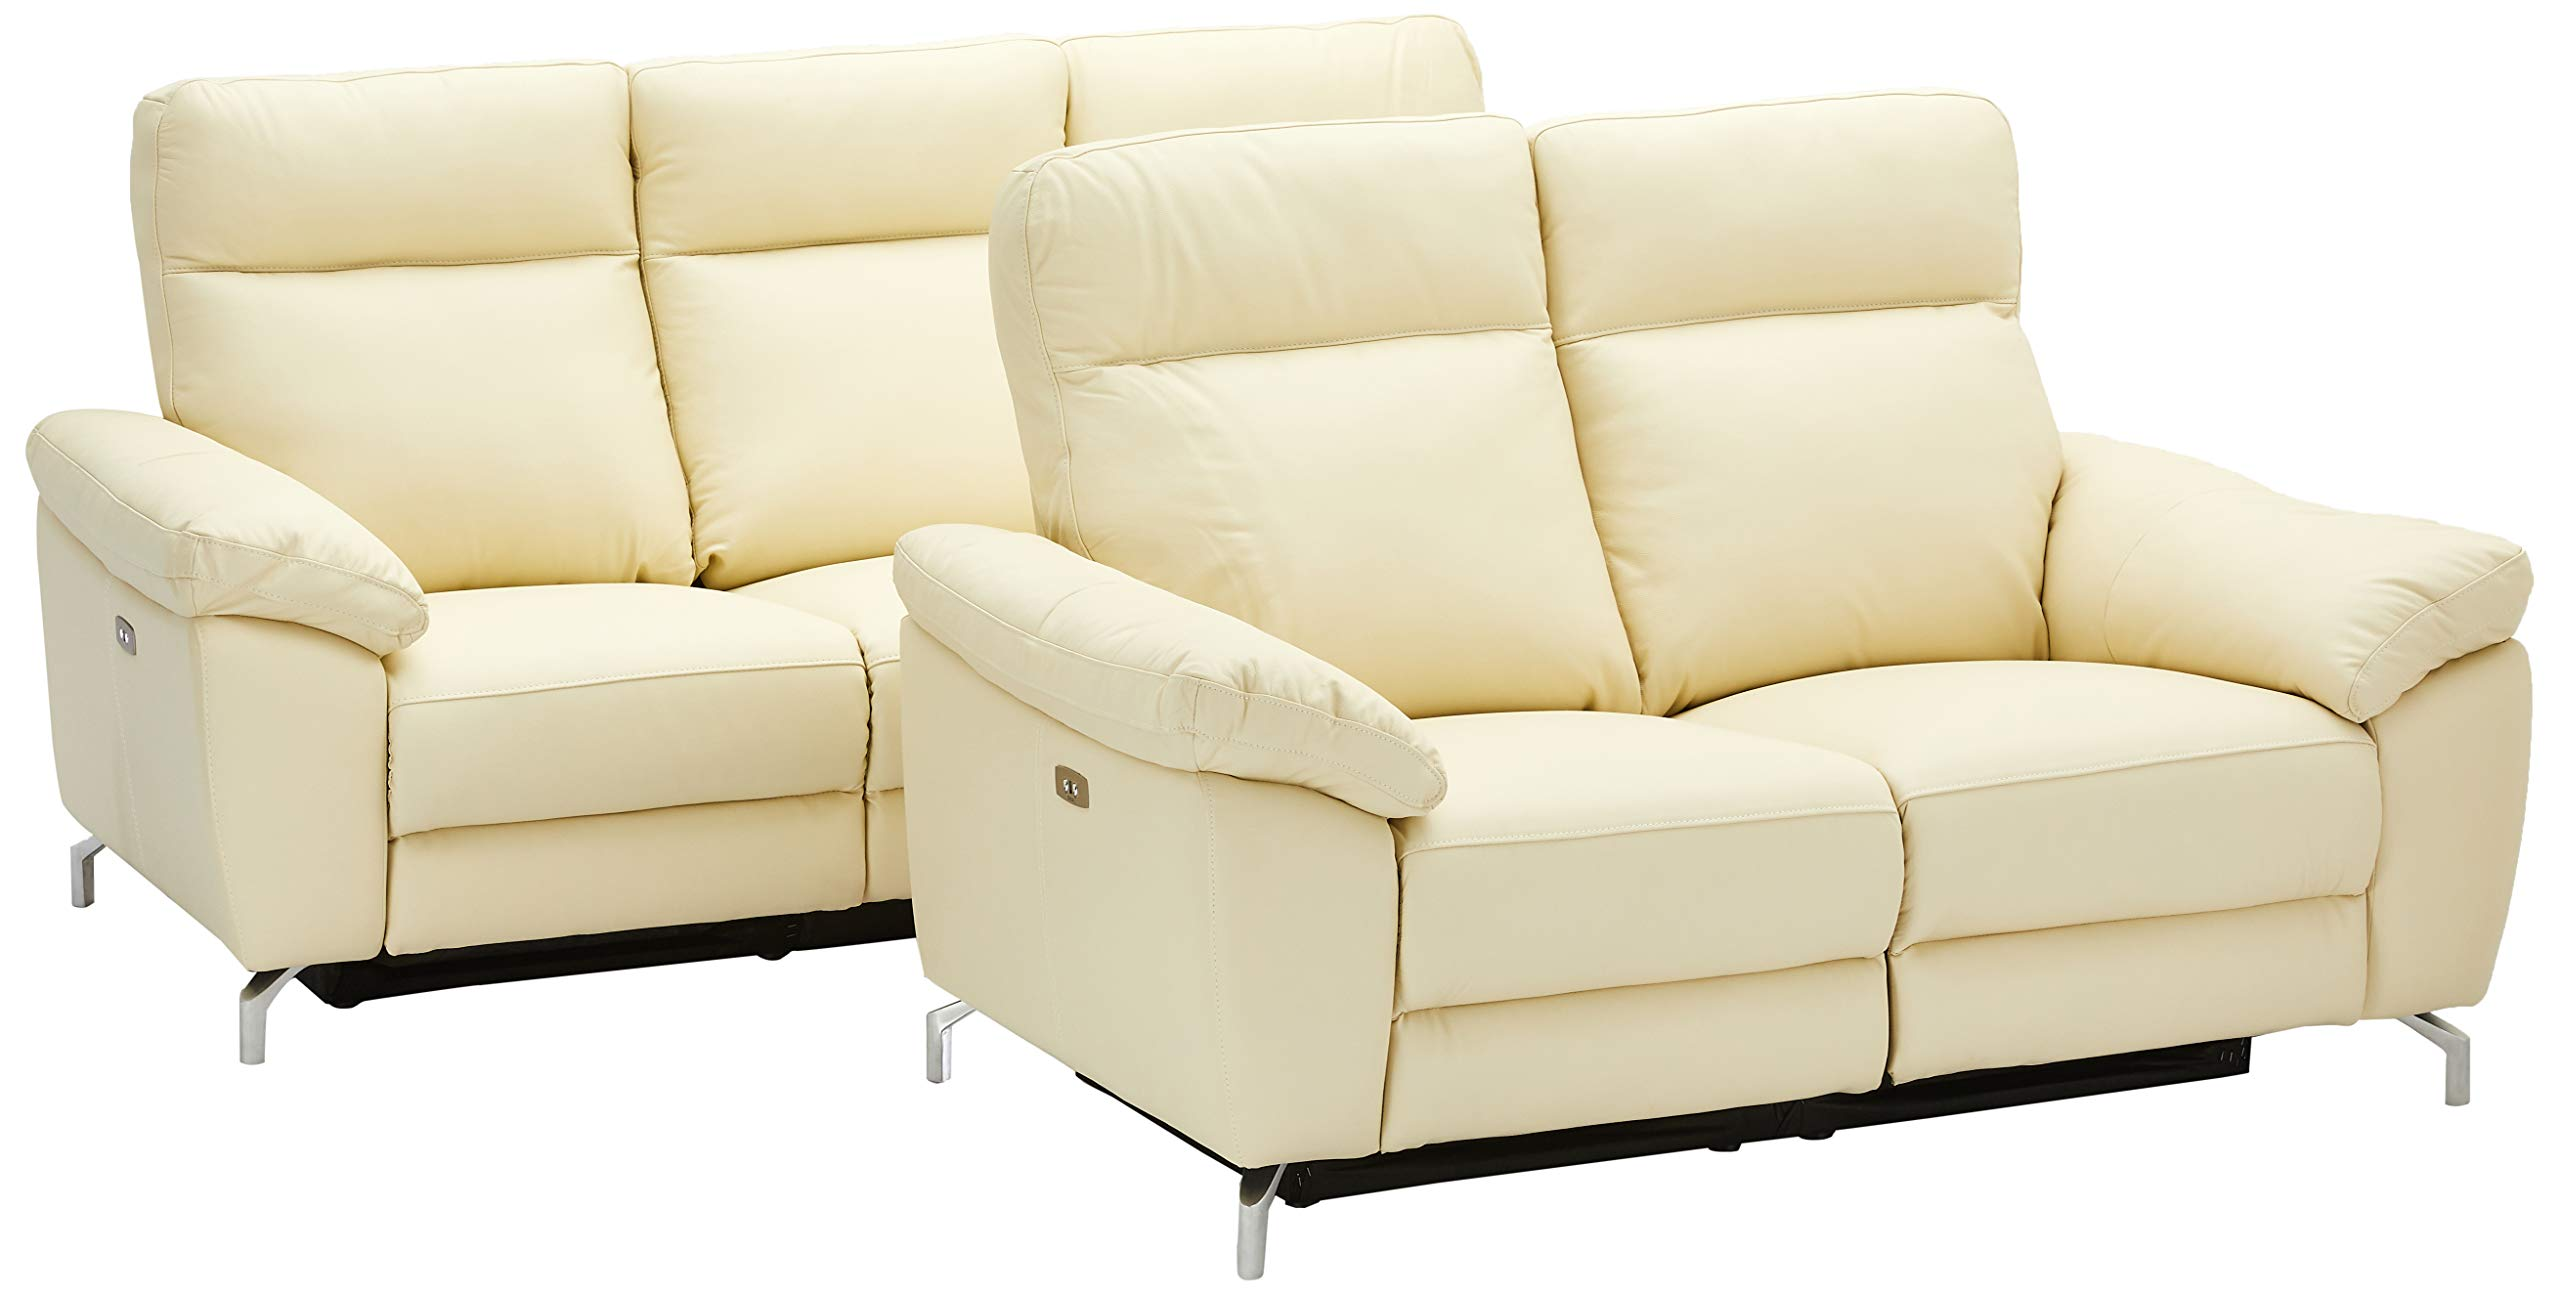 Full Size of Relaxsofa Elektrisch 3 Sitzer Leder Marcis Himolla Relaxsessel Bewertung Verstellbar Stoff Microfaser Paosa Ledergarnitur Sofa Mit Elektrischer Wohnzimmer Relaxsofa Elektrisch